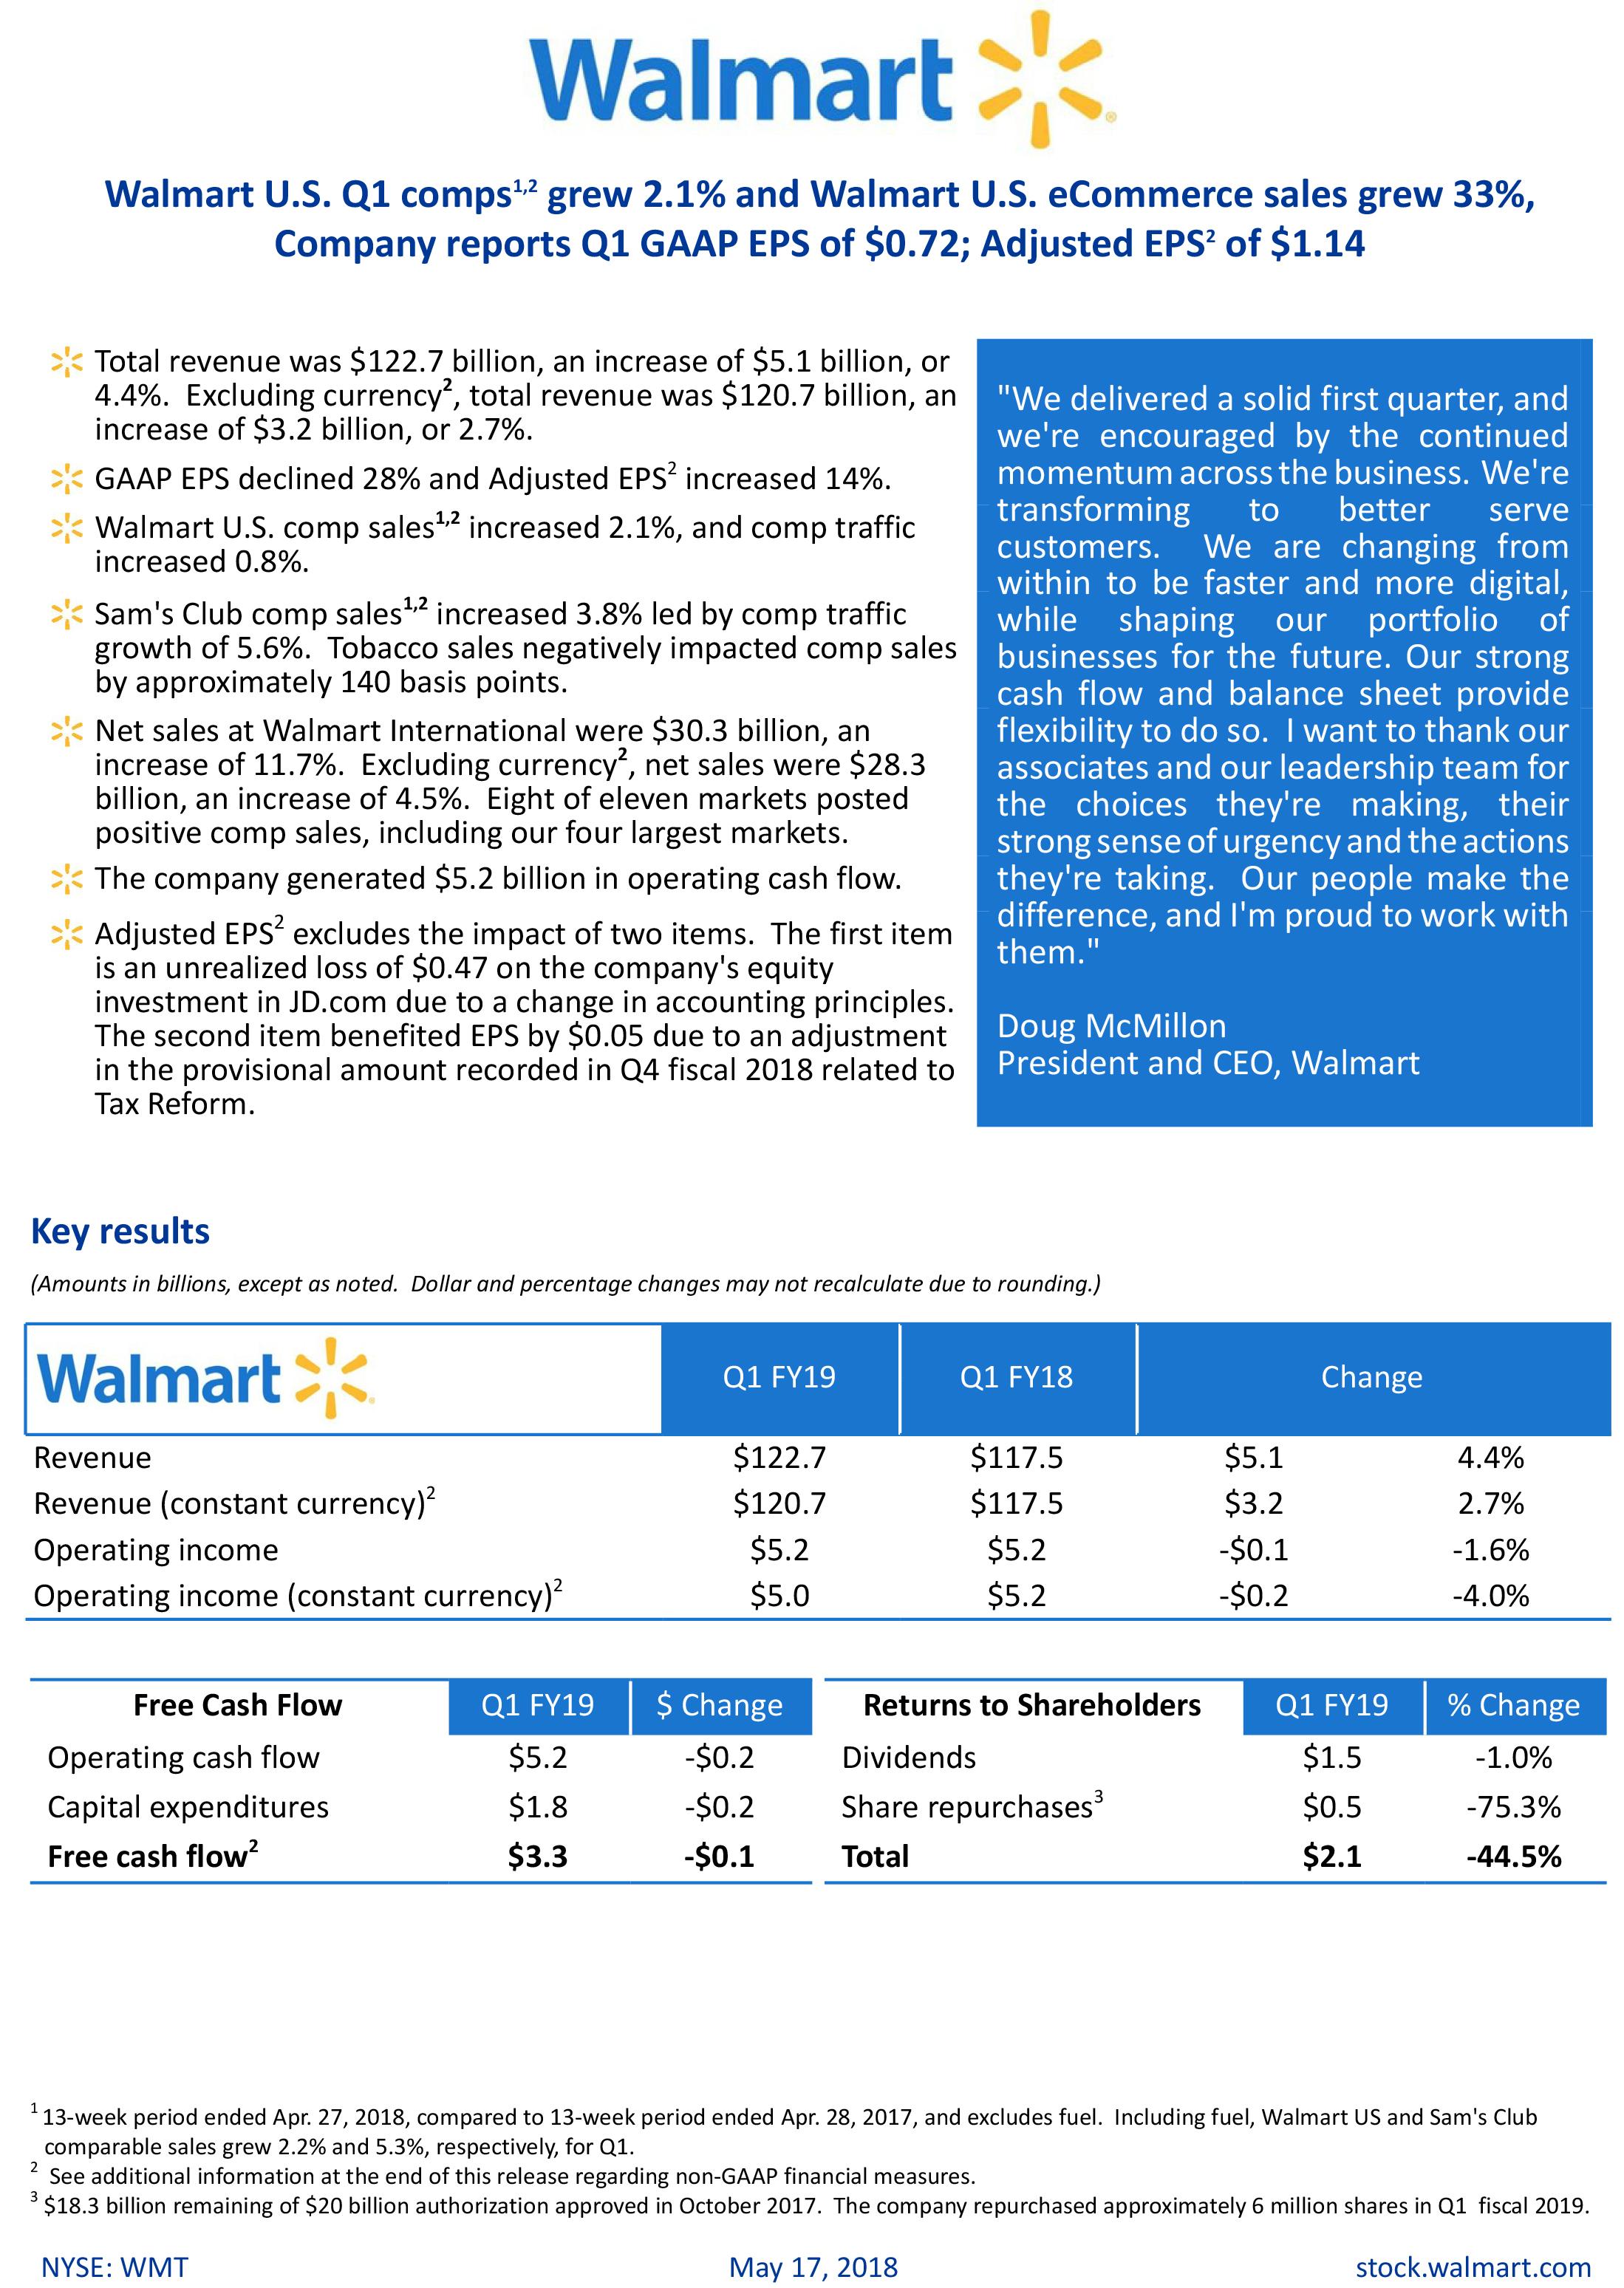 Walmart U.S. Q1 comps grew 2.1% and Walmart U.S. eCommerce sales ...